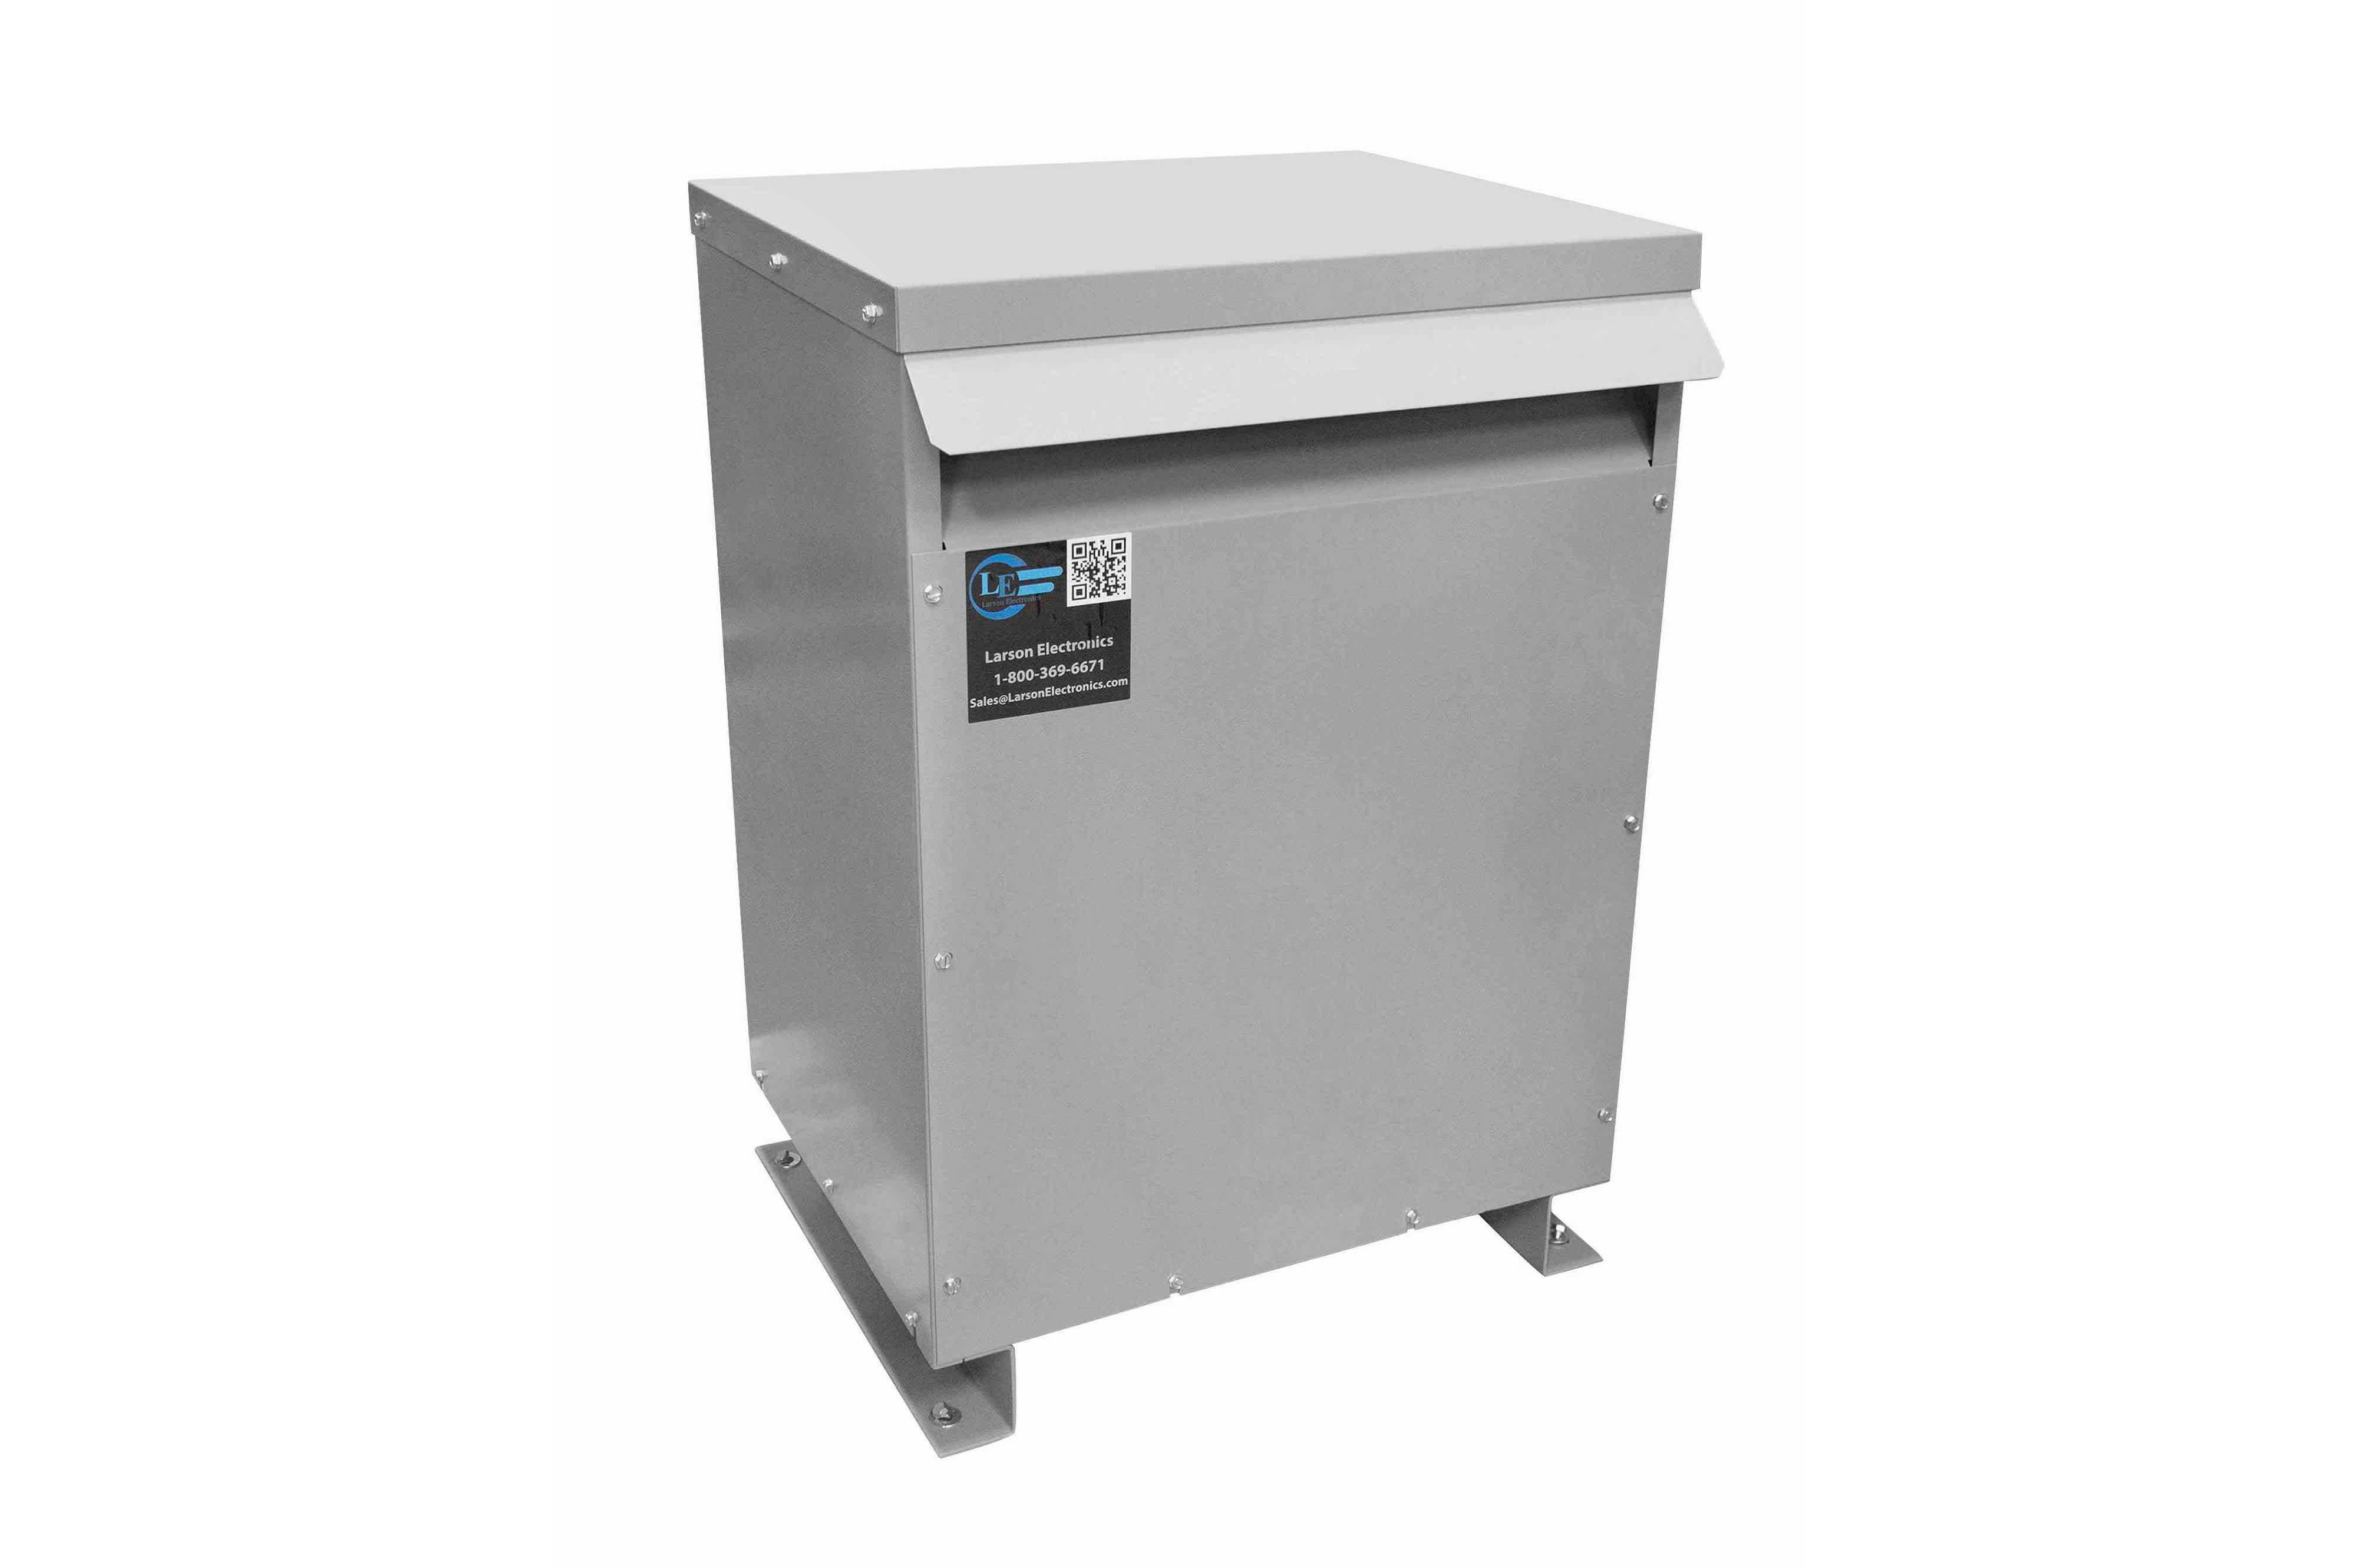 300 kVA 3PH DOE Transformer, 460V Delta Primary, 600Y/347 Wye-N Secondary, N3R, Ventilated, 60 Hz